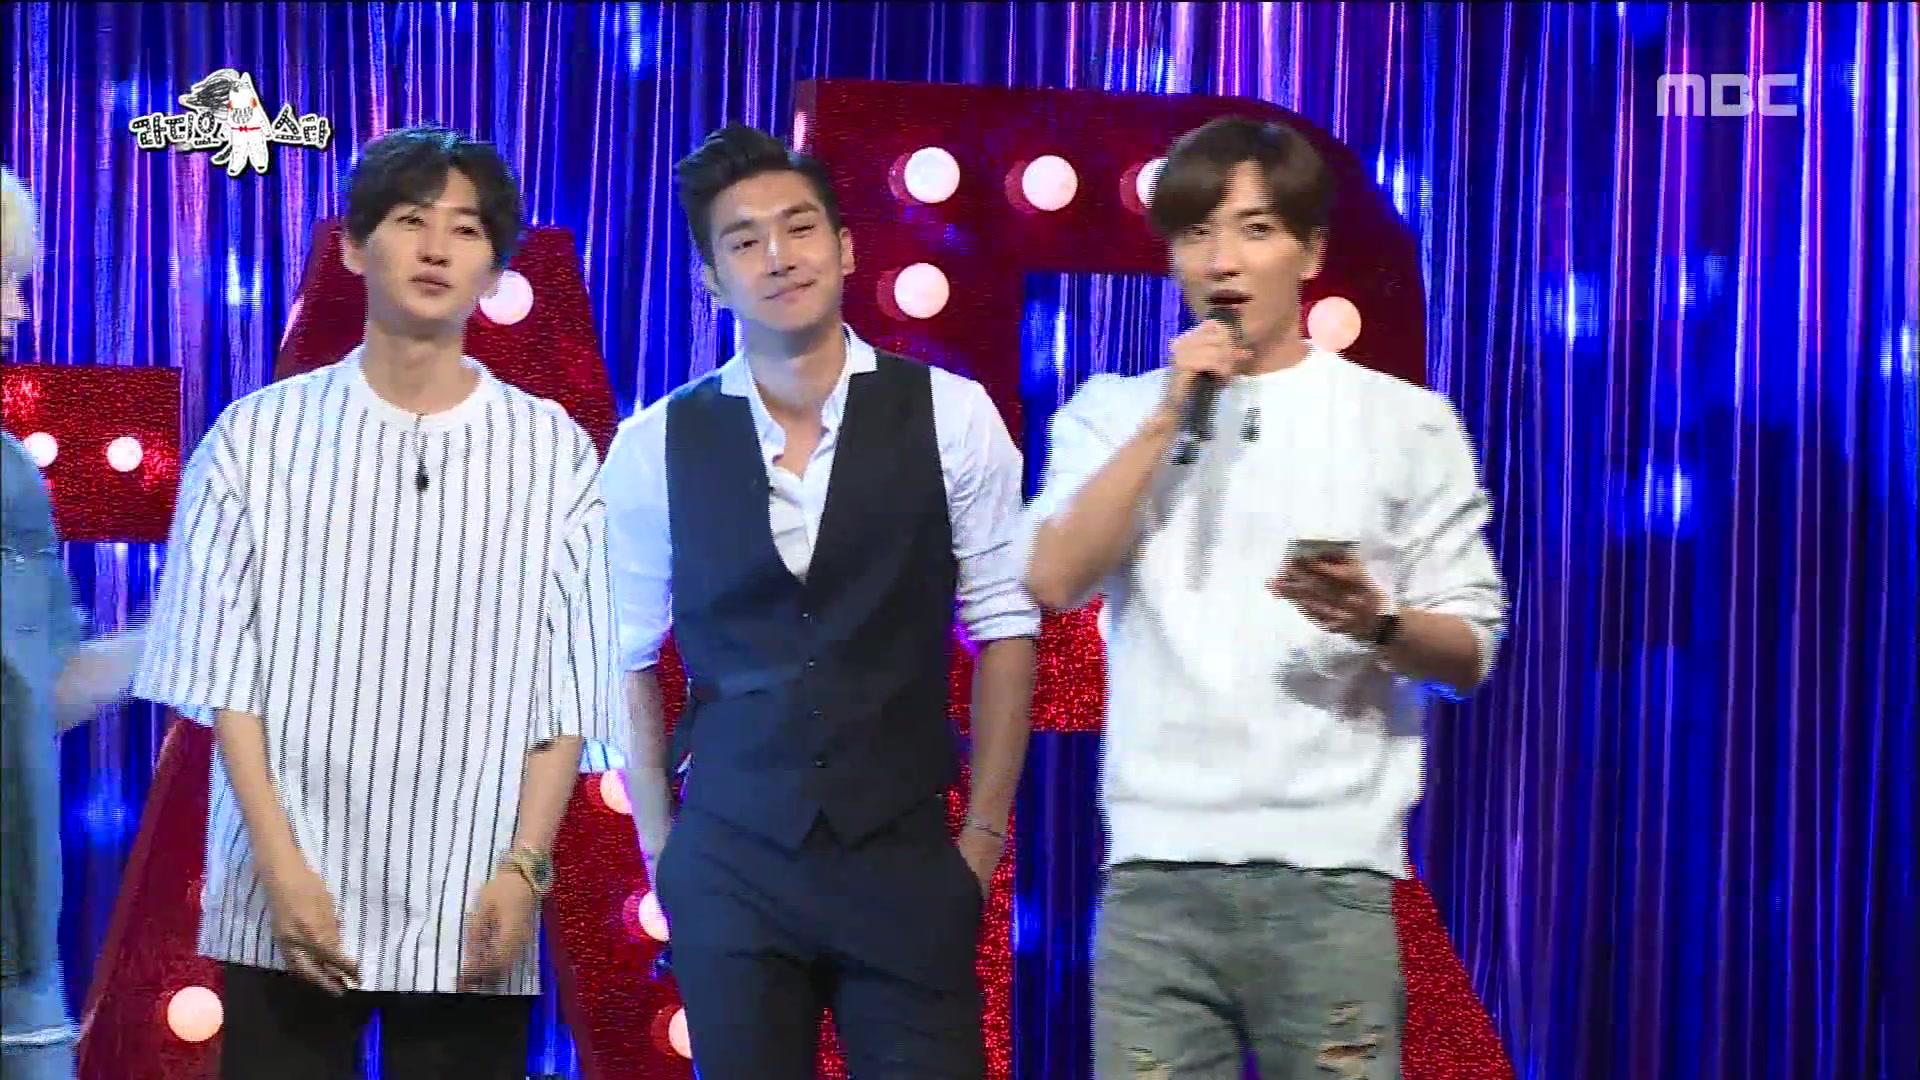 Watch Super Junior's Version of 'I Believe' (Ep 434): Radio Star Highlights